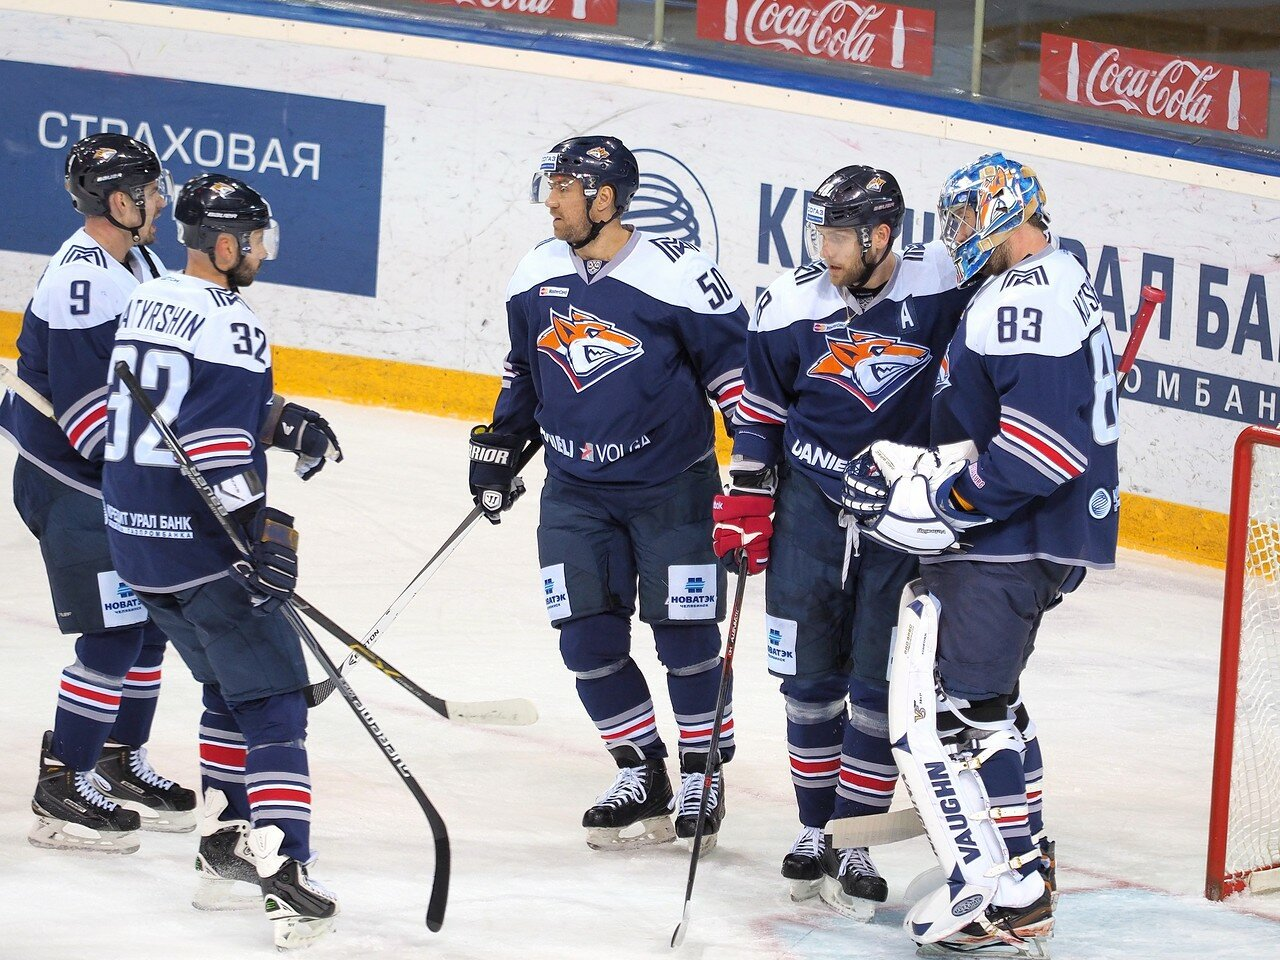 128Восток 1/2 плей-офф Металлург - Сибирь 08.03.2016